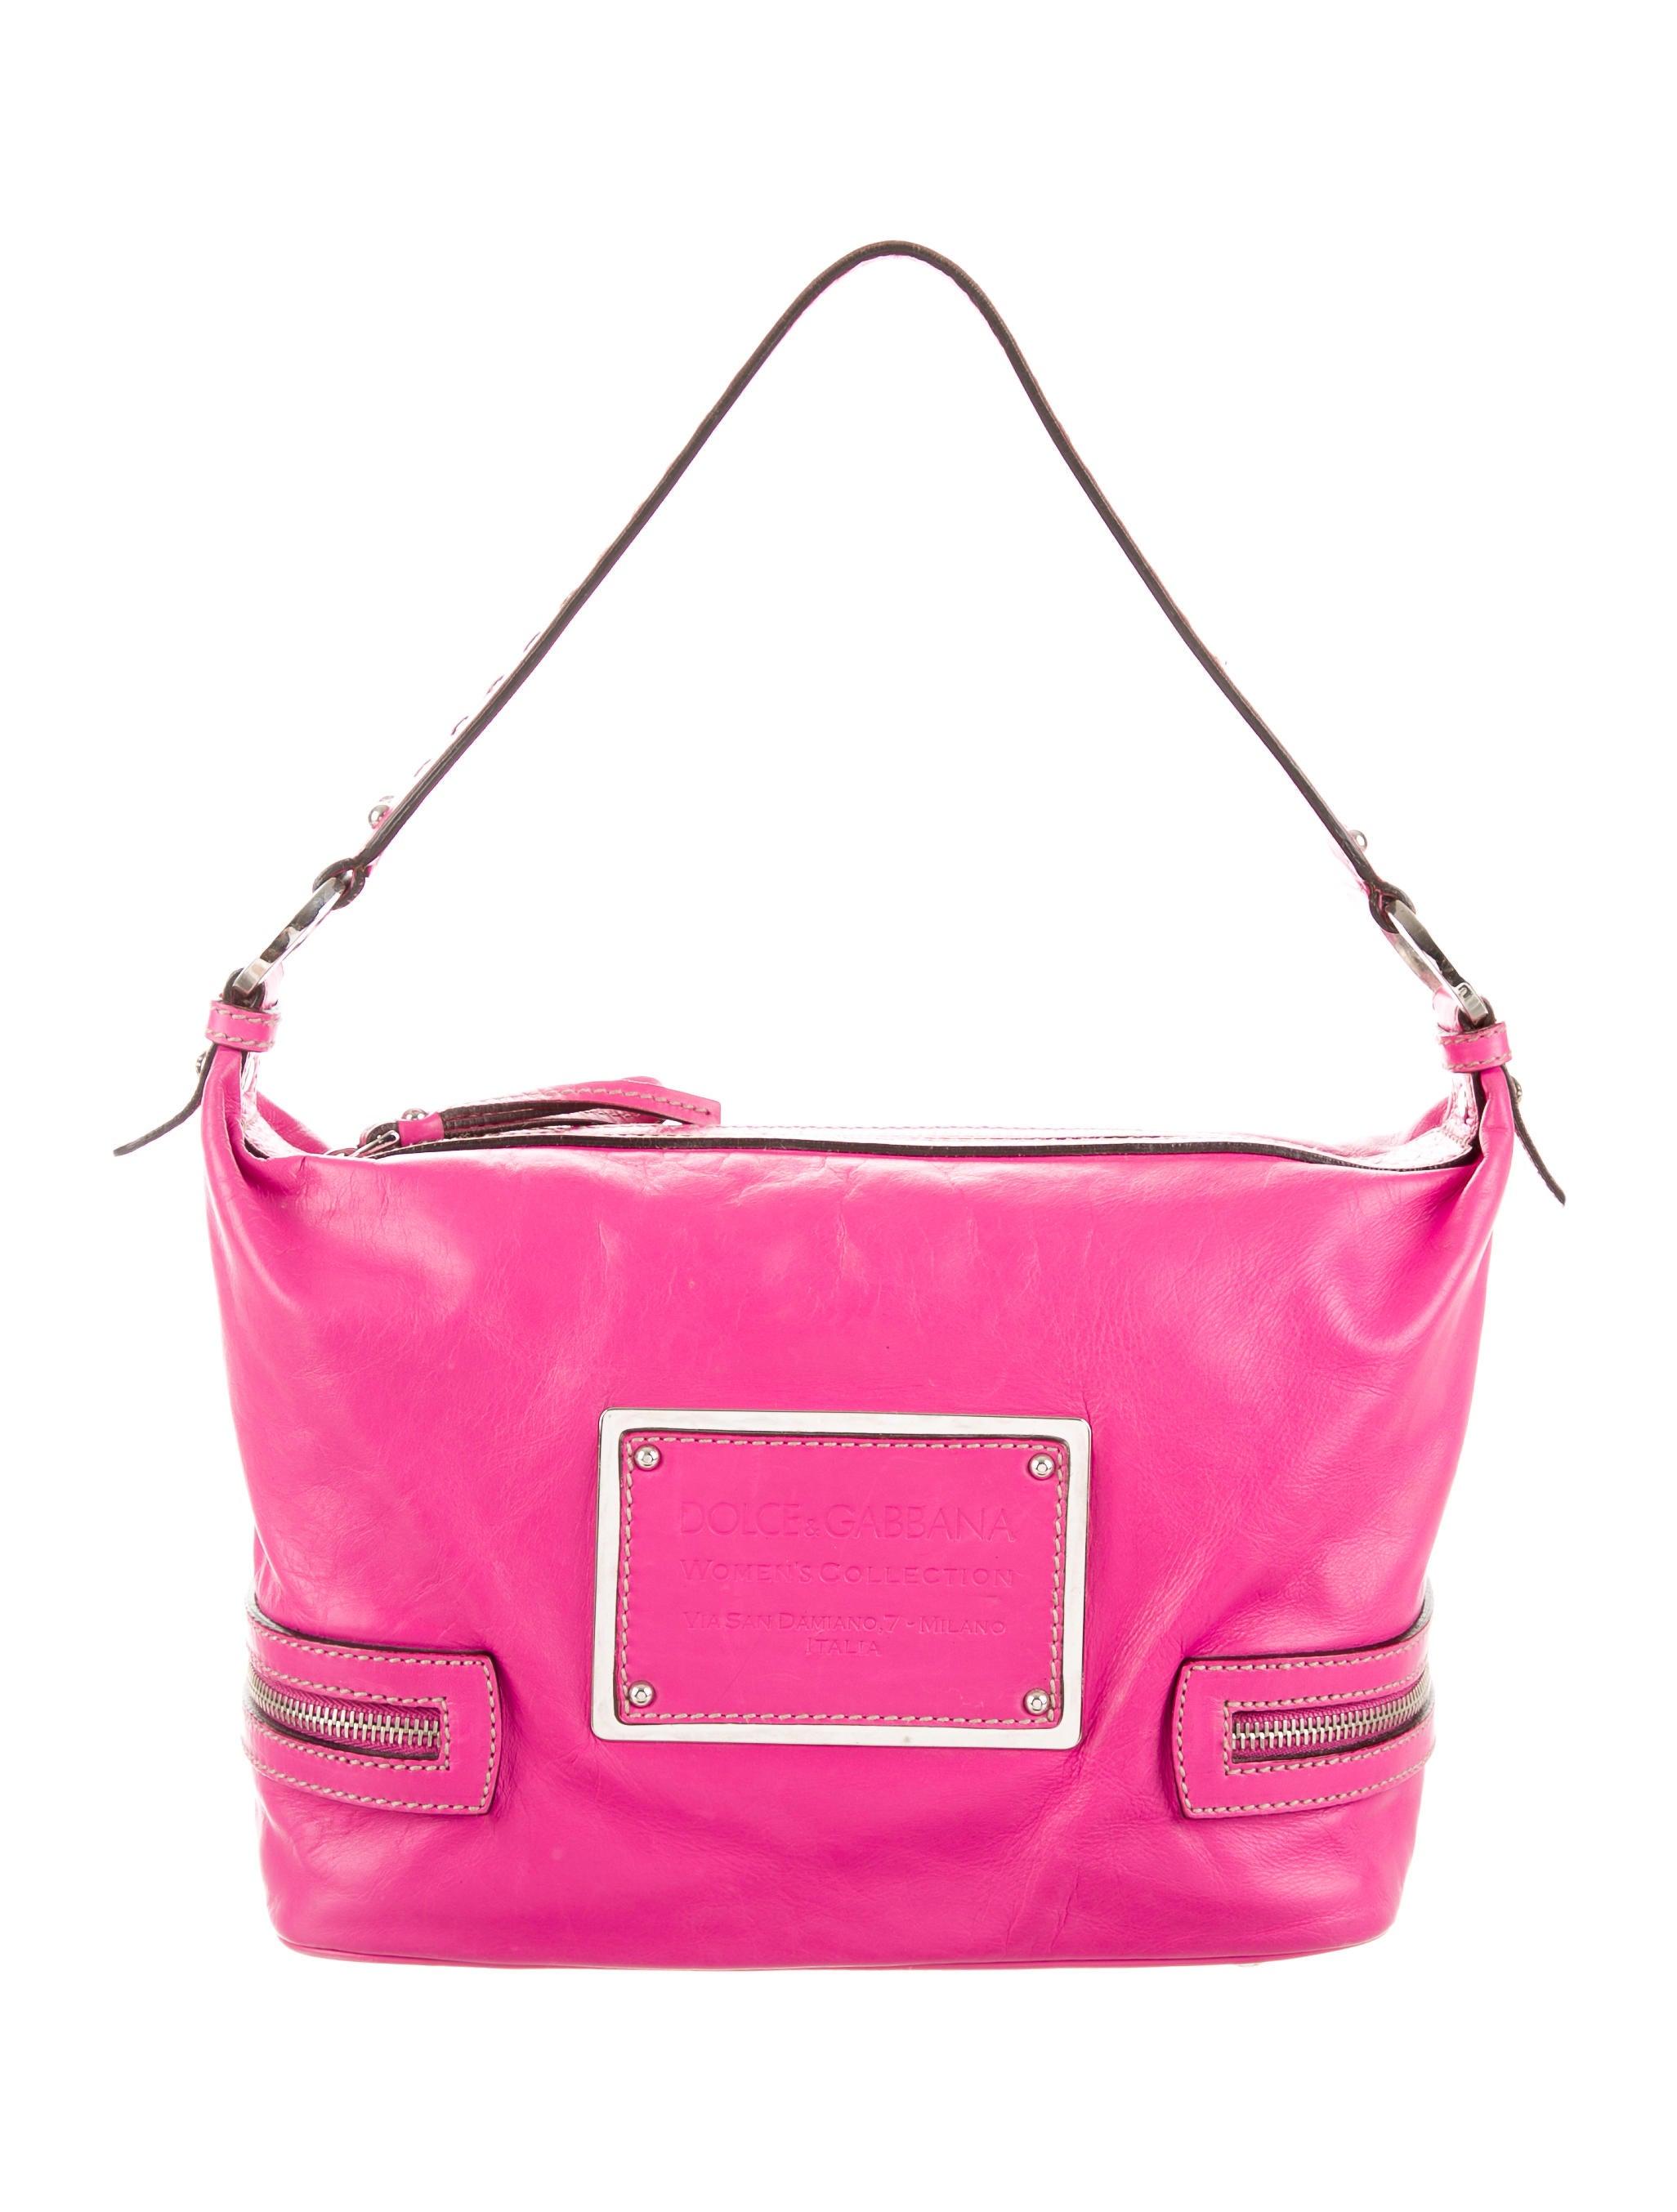 8b1f7fcc2163 Dolce   Gabbana Miss Silky Bag - Handbags - DAG61352